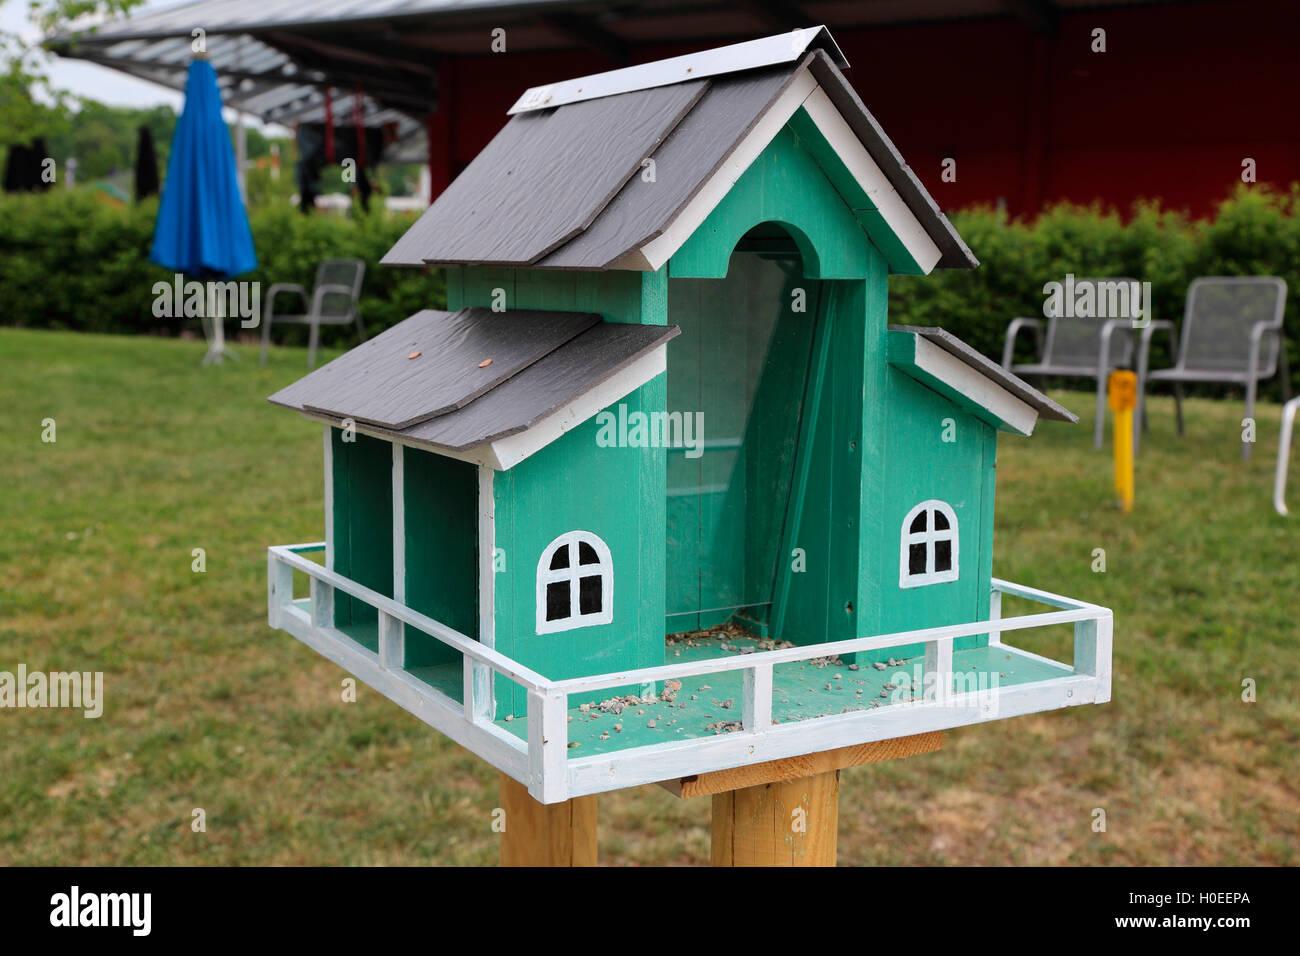 Schmalkalden horticultural show bird house - Stock Image